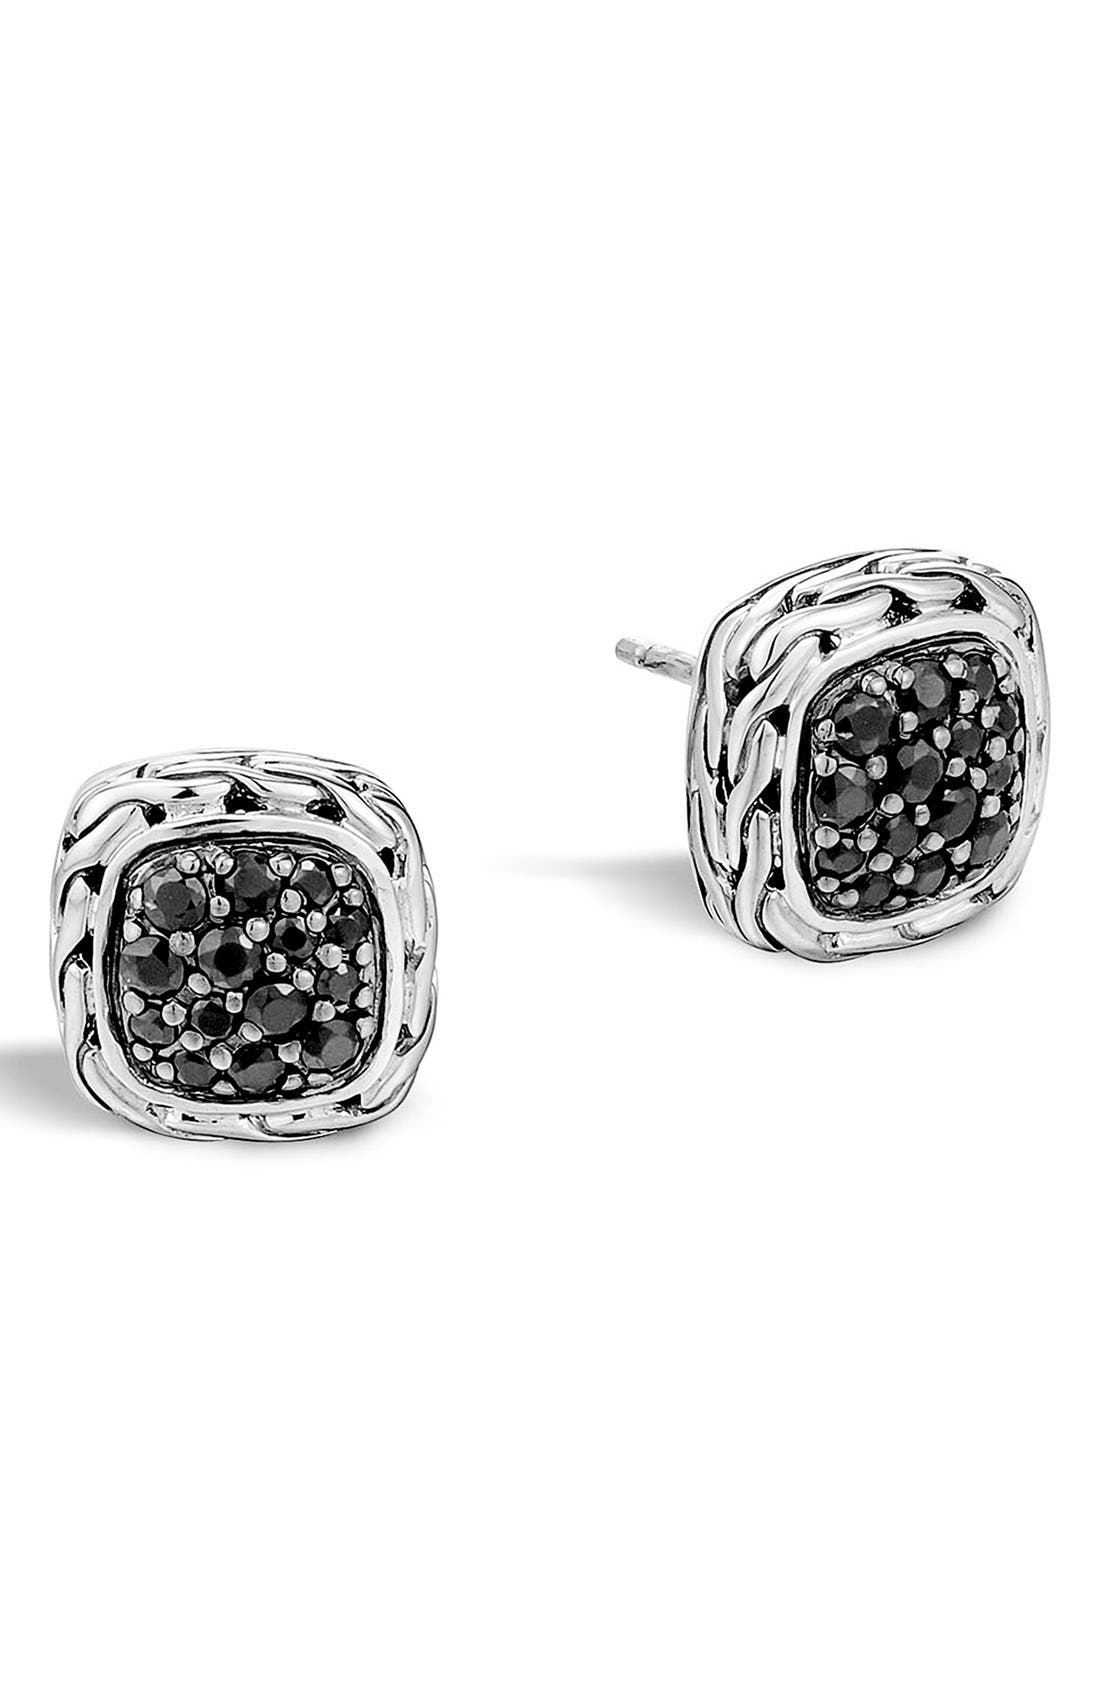 John Hardy 'Classic Chain' Small Square Stud Earrings